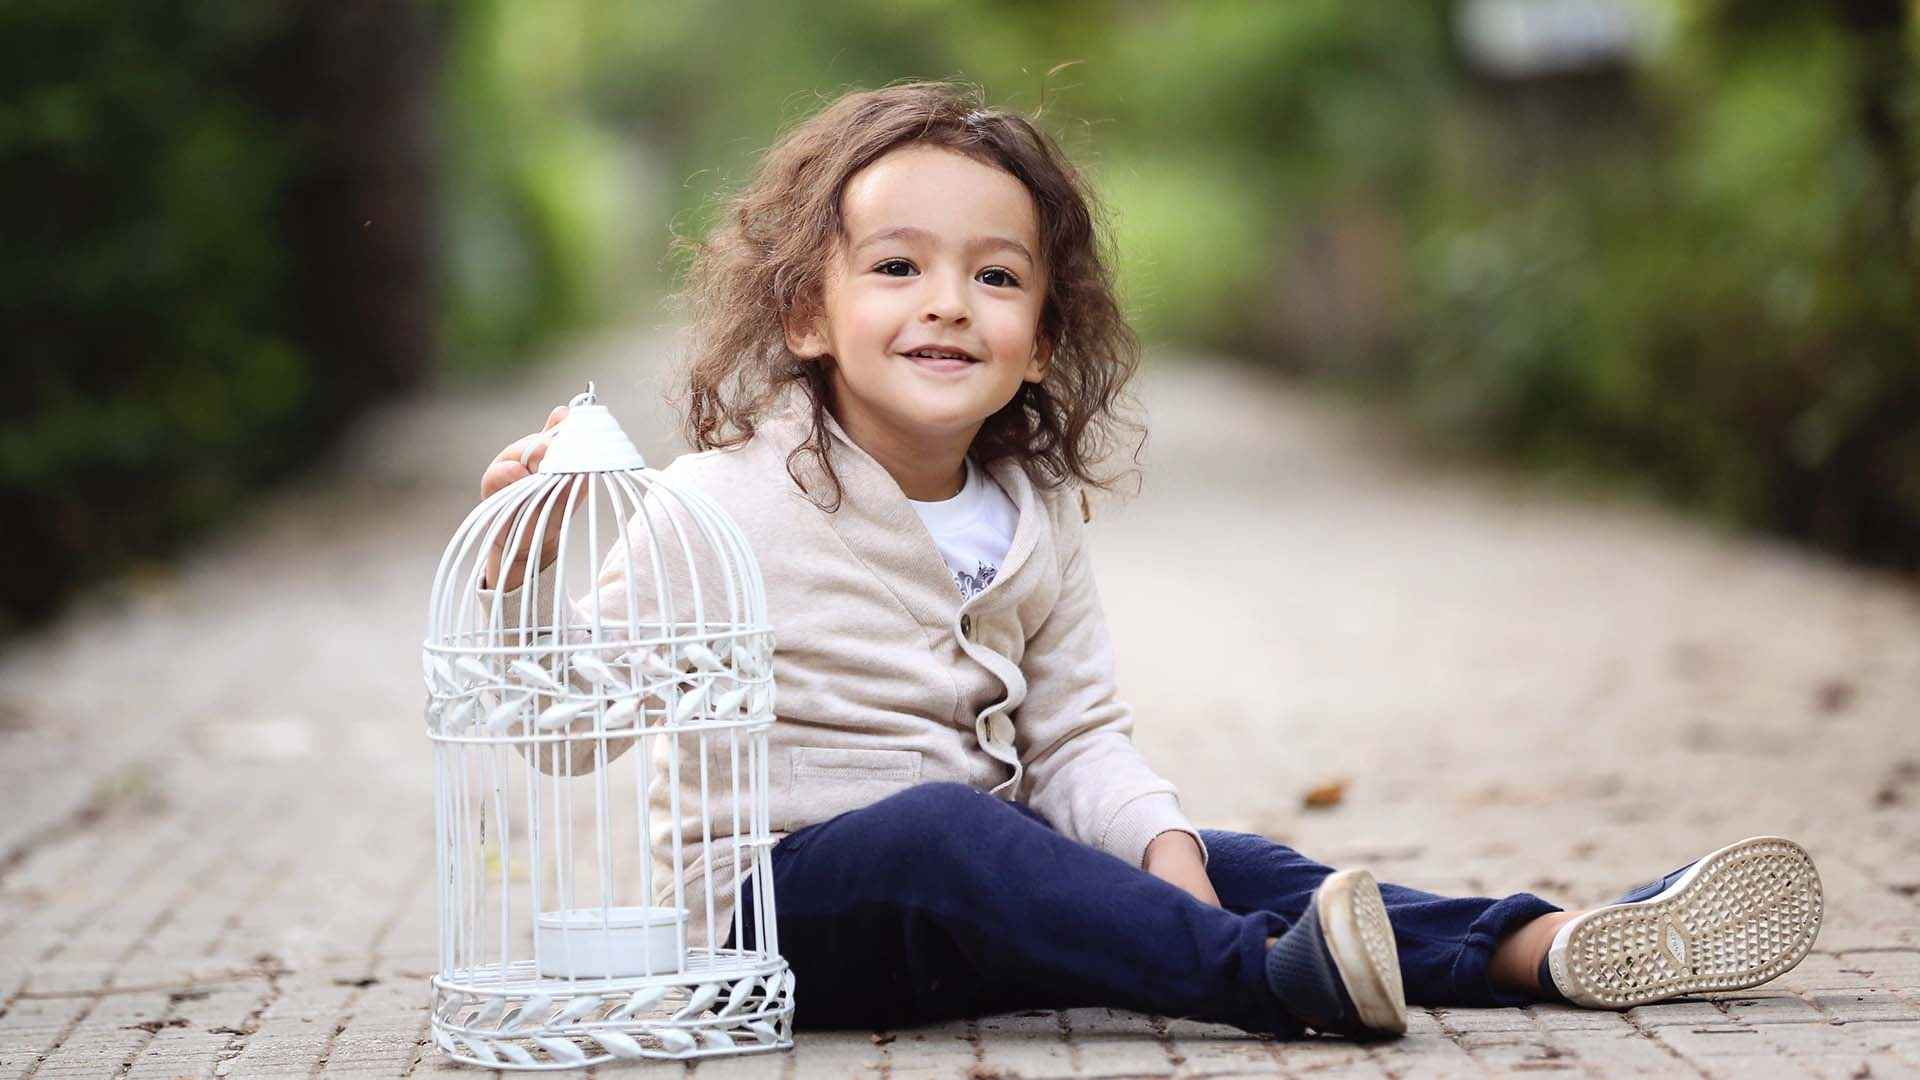 children photography calculator sock - HD1920×1080